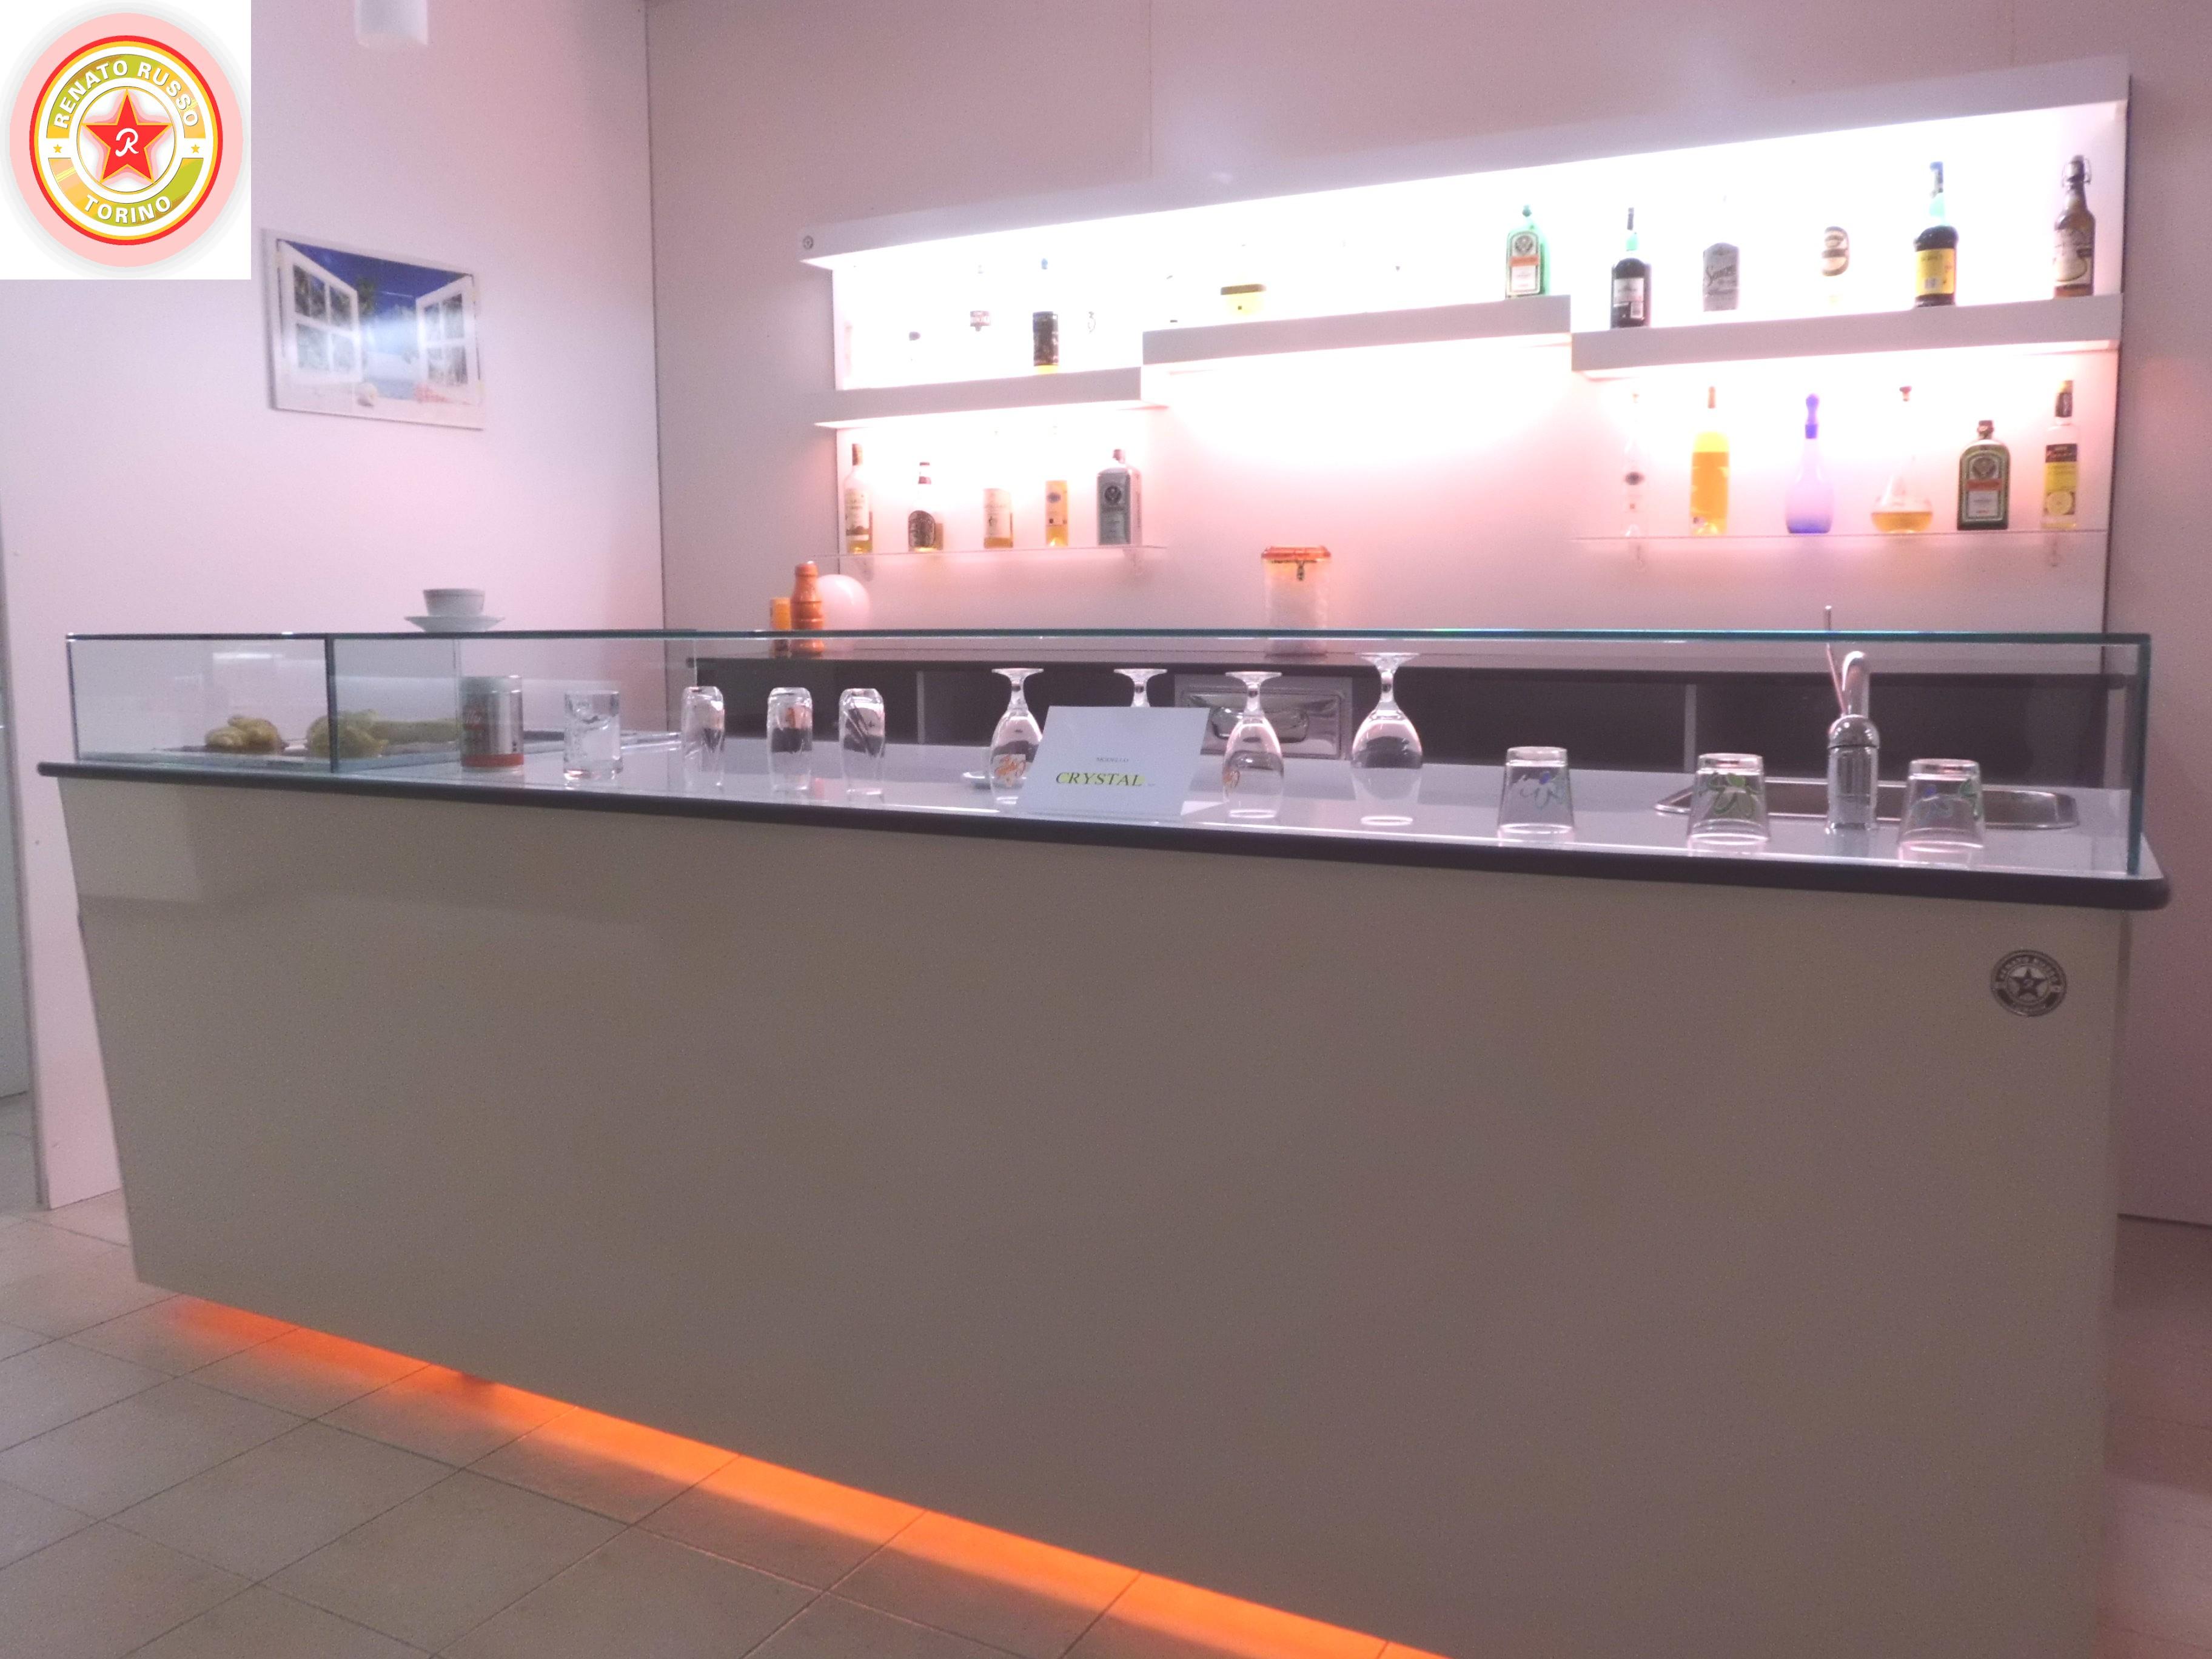 banco bar crystal, un banco bar di ultima generazione, un bancone bar ...